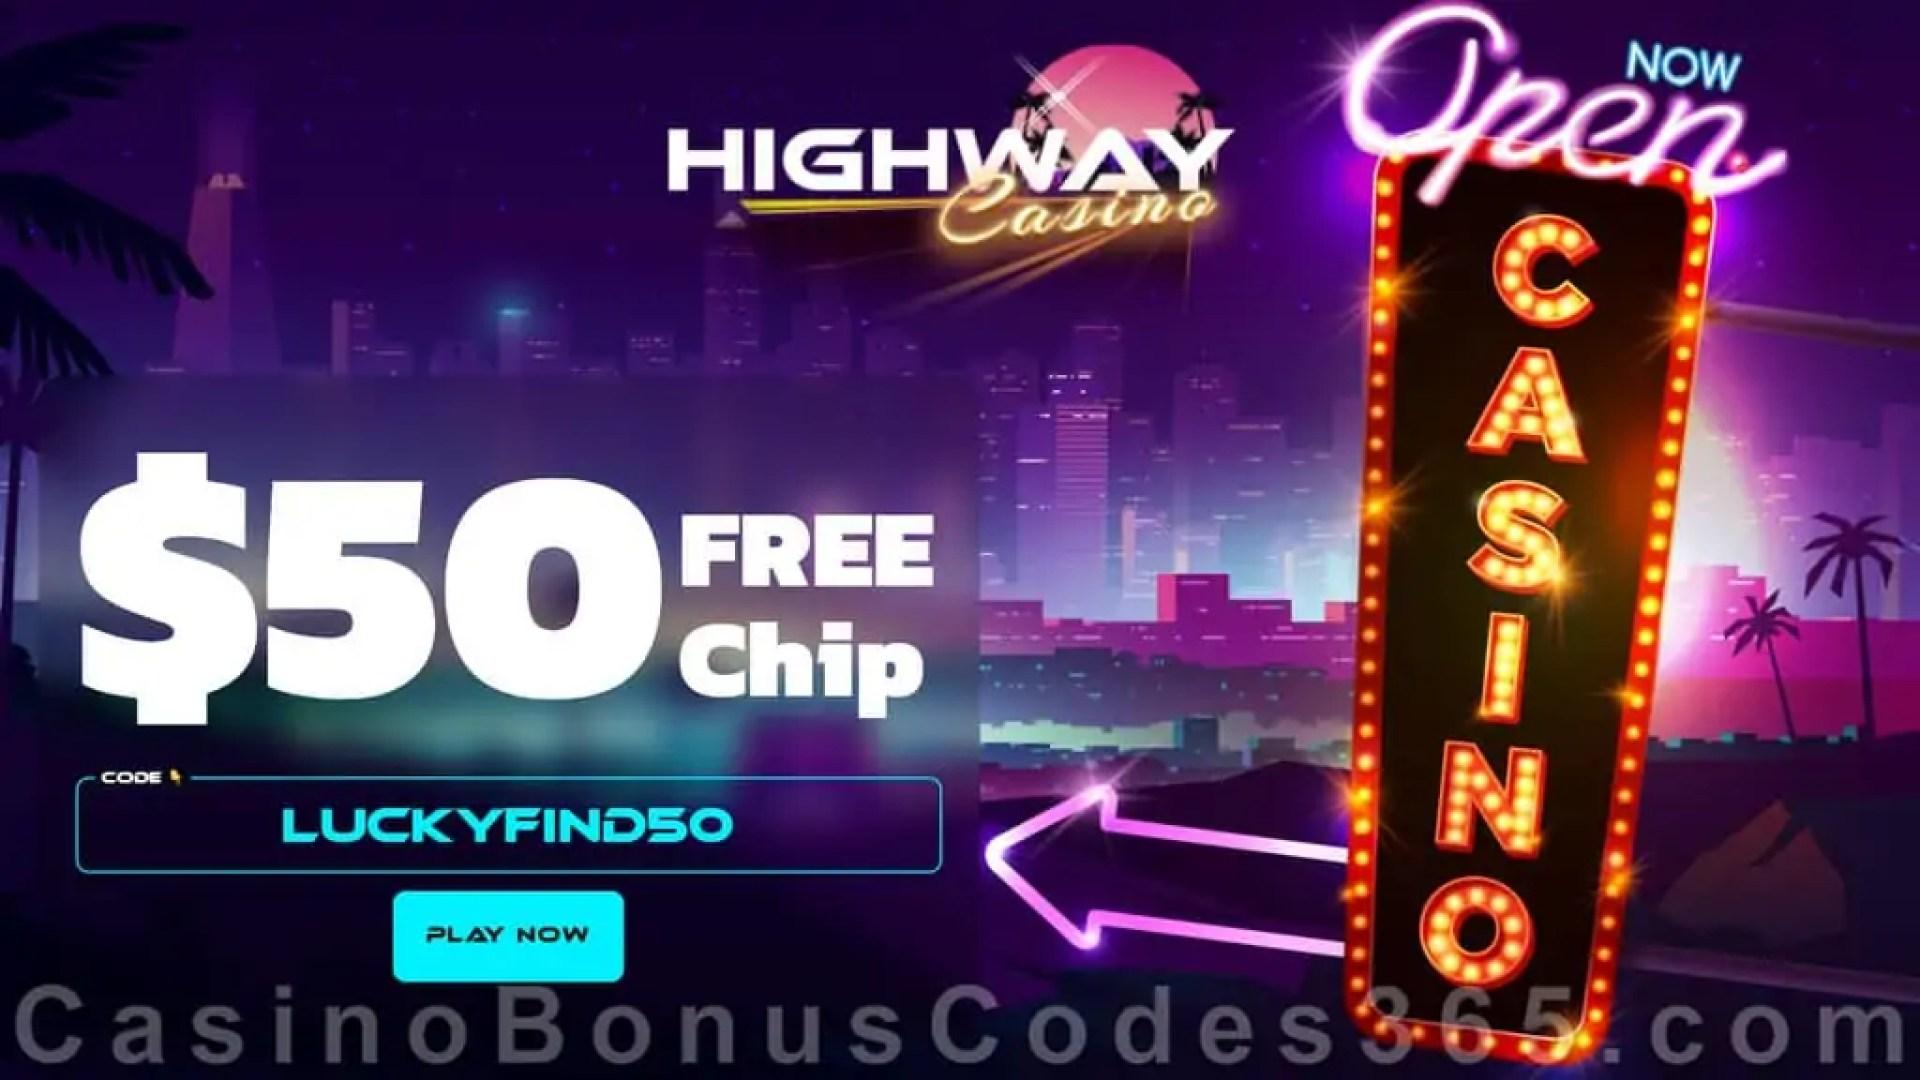 Highway Casino $50 FREE Chip Mega No Deposit Welcome Deal RTG